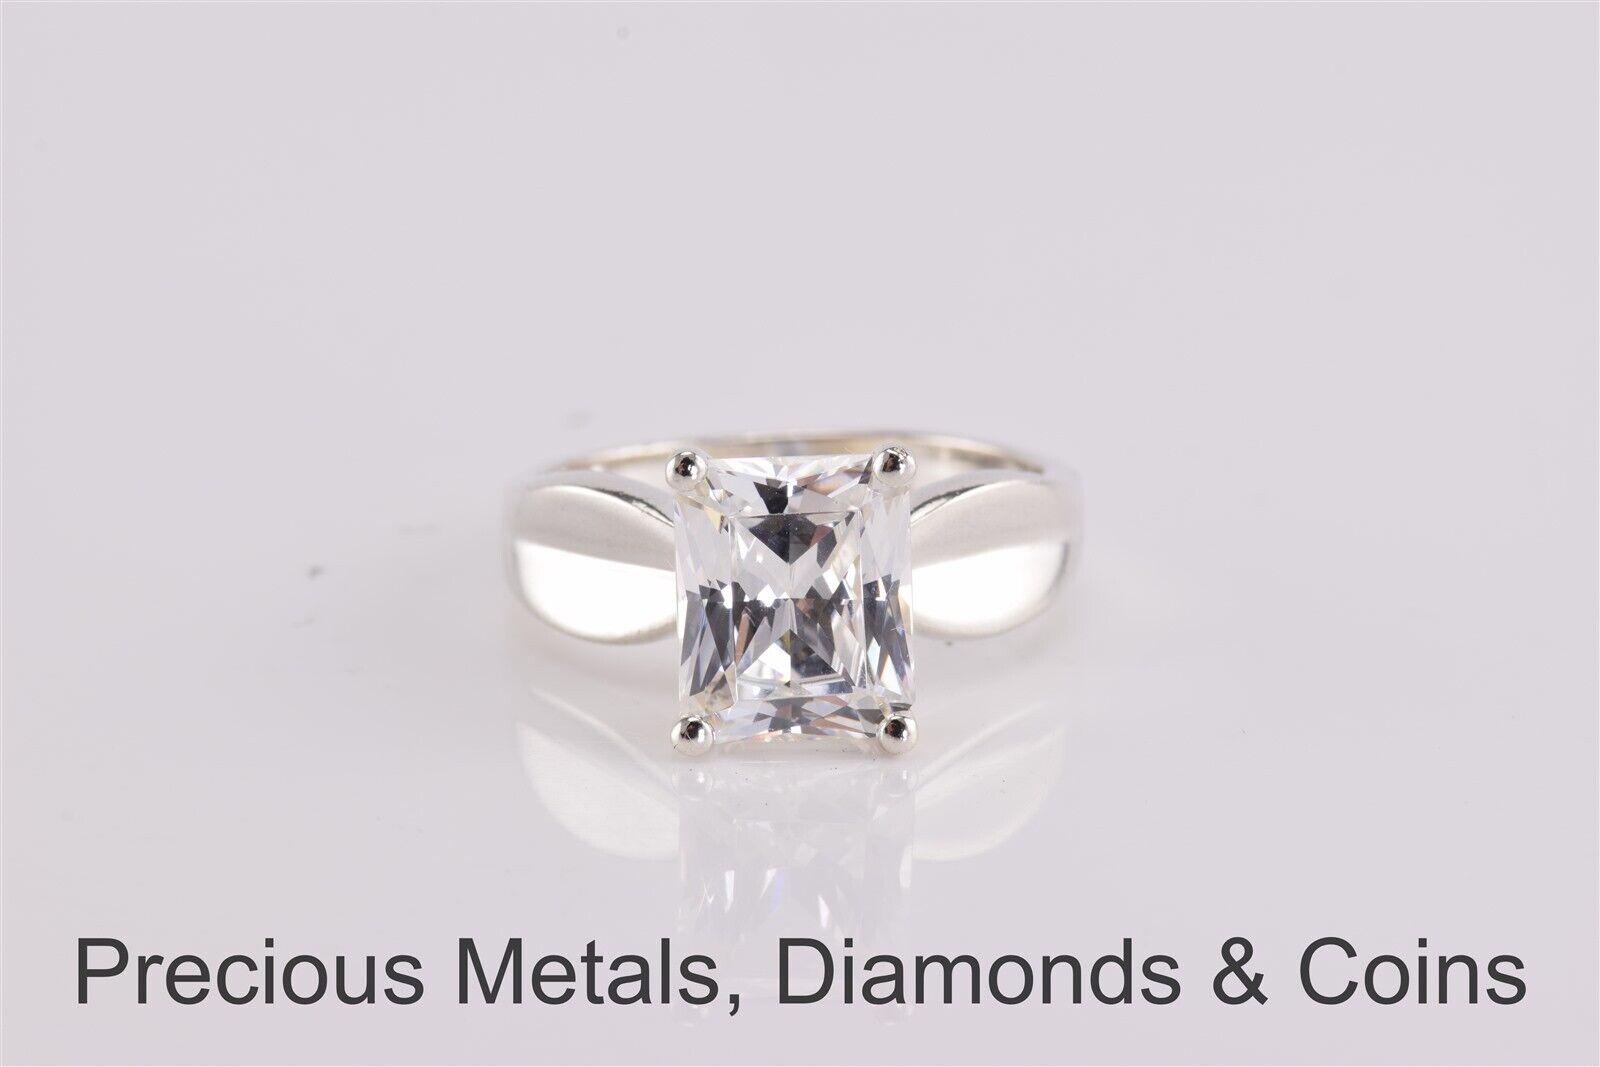 baf42f05827c1 Details about Diamonique Sterling Silver Emerald Cut Cubic Zirconia  Solitaire Ring 925 Sz: 10